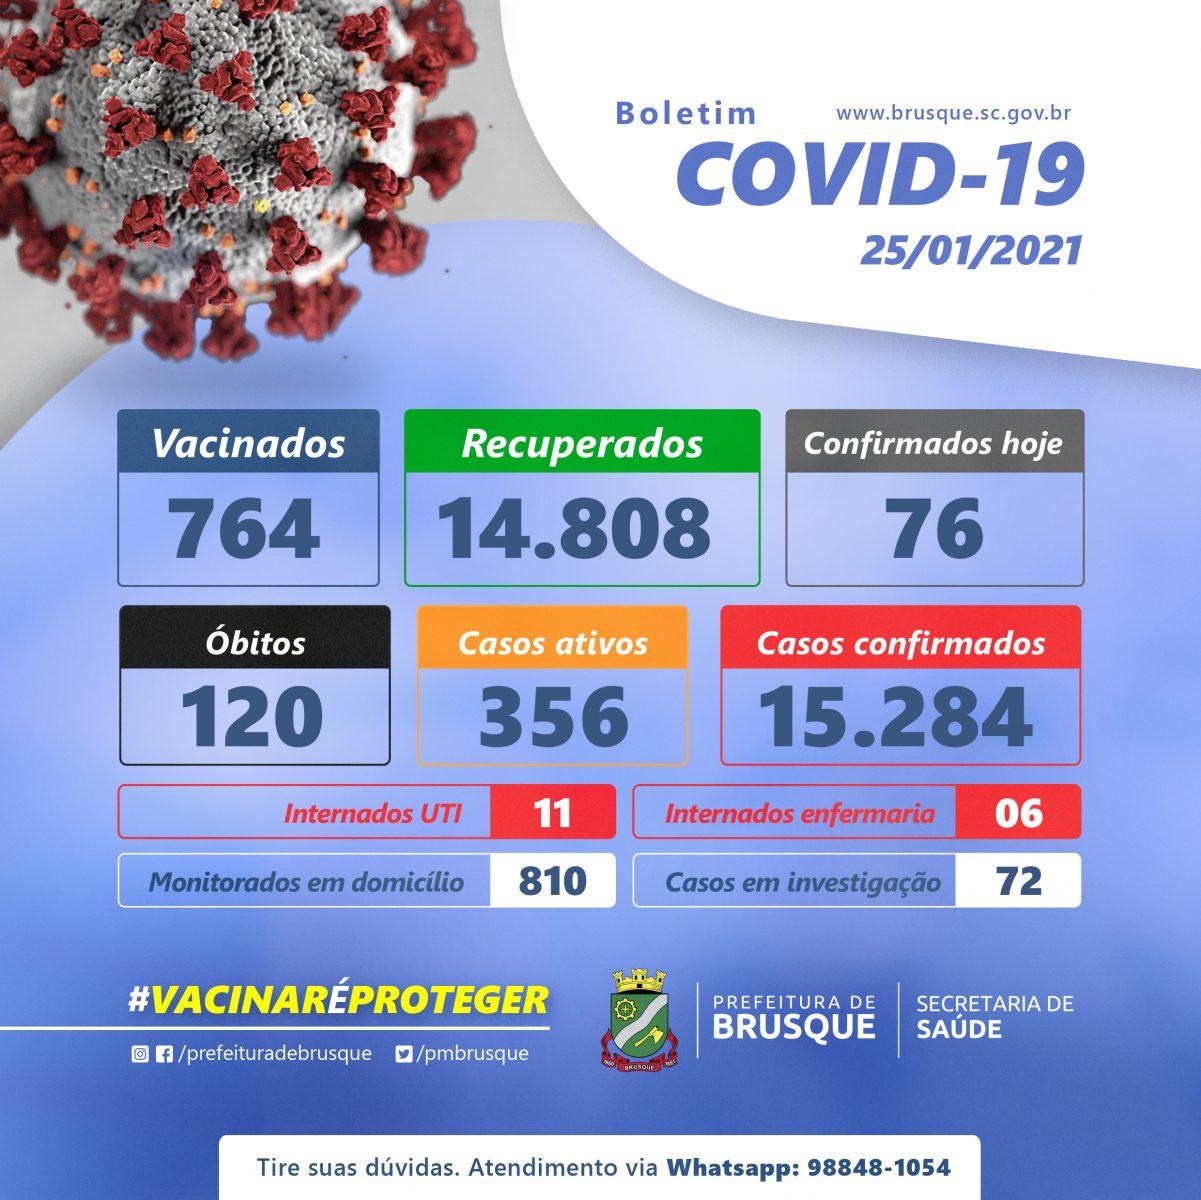 Covid-19: Confira o boletim epidemiológico desta segunda-feira (25)